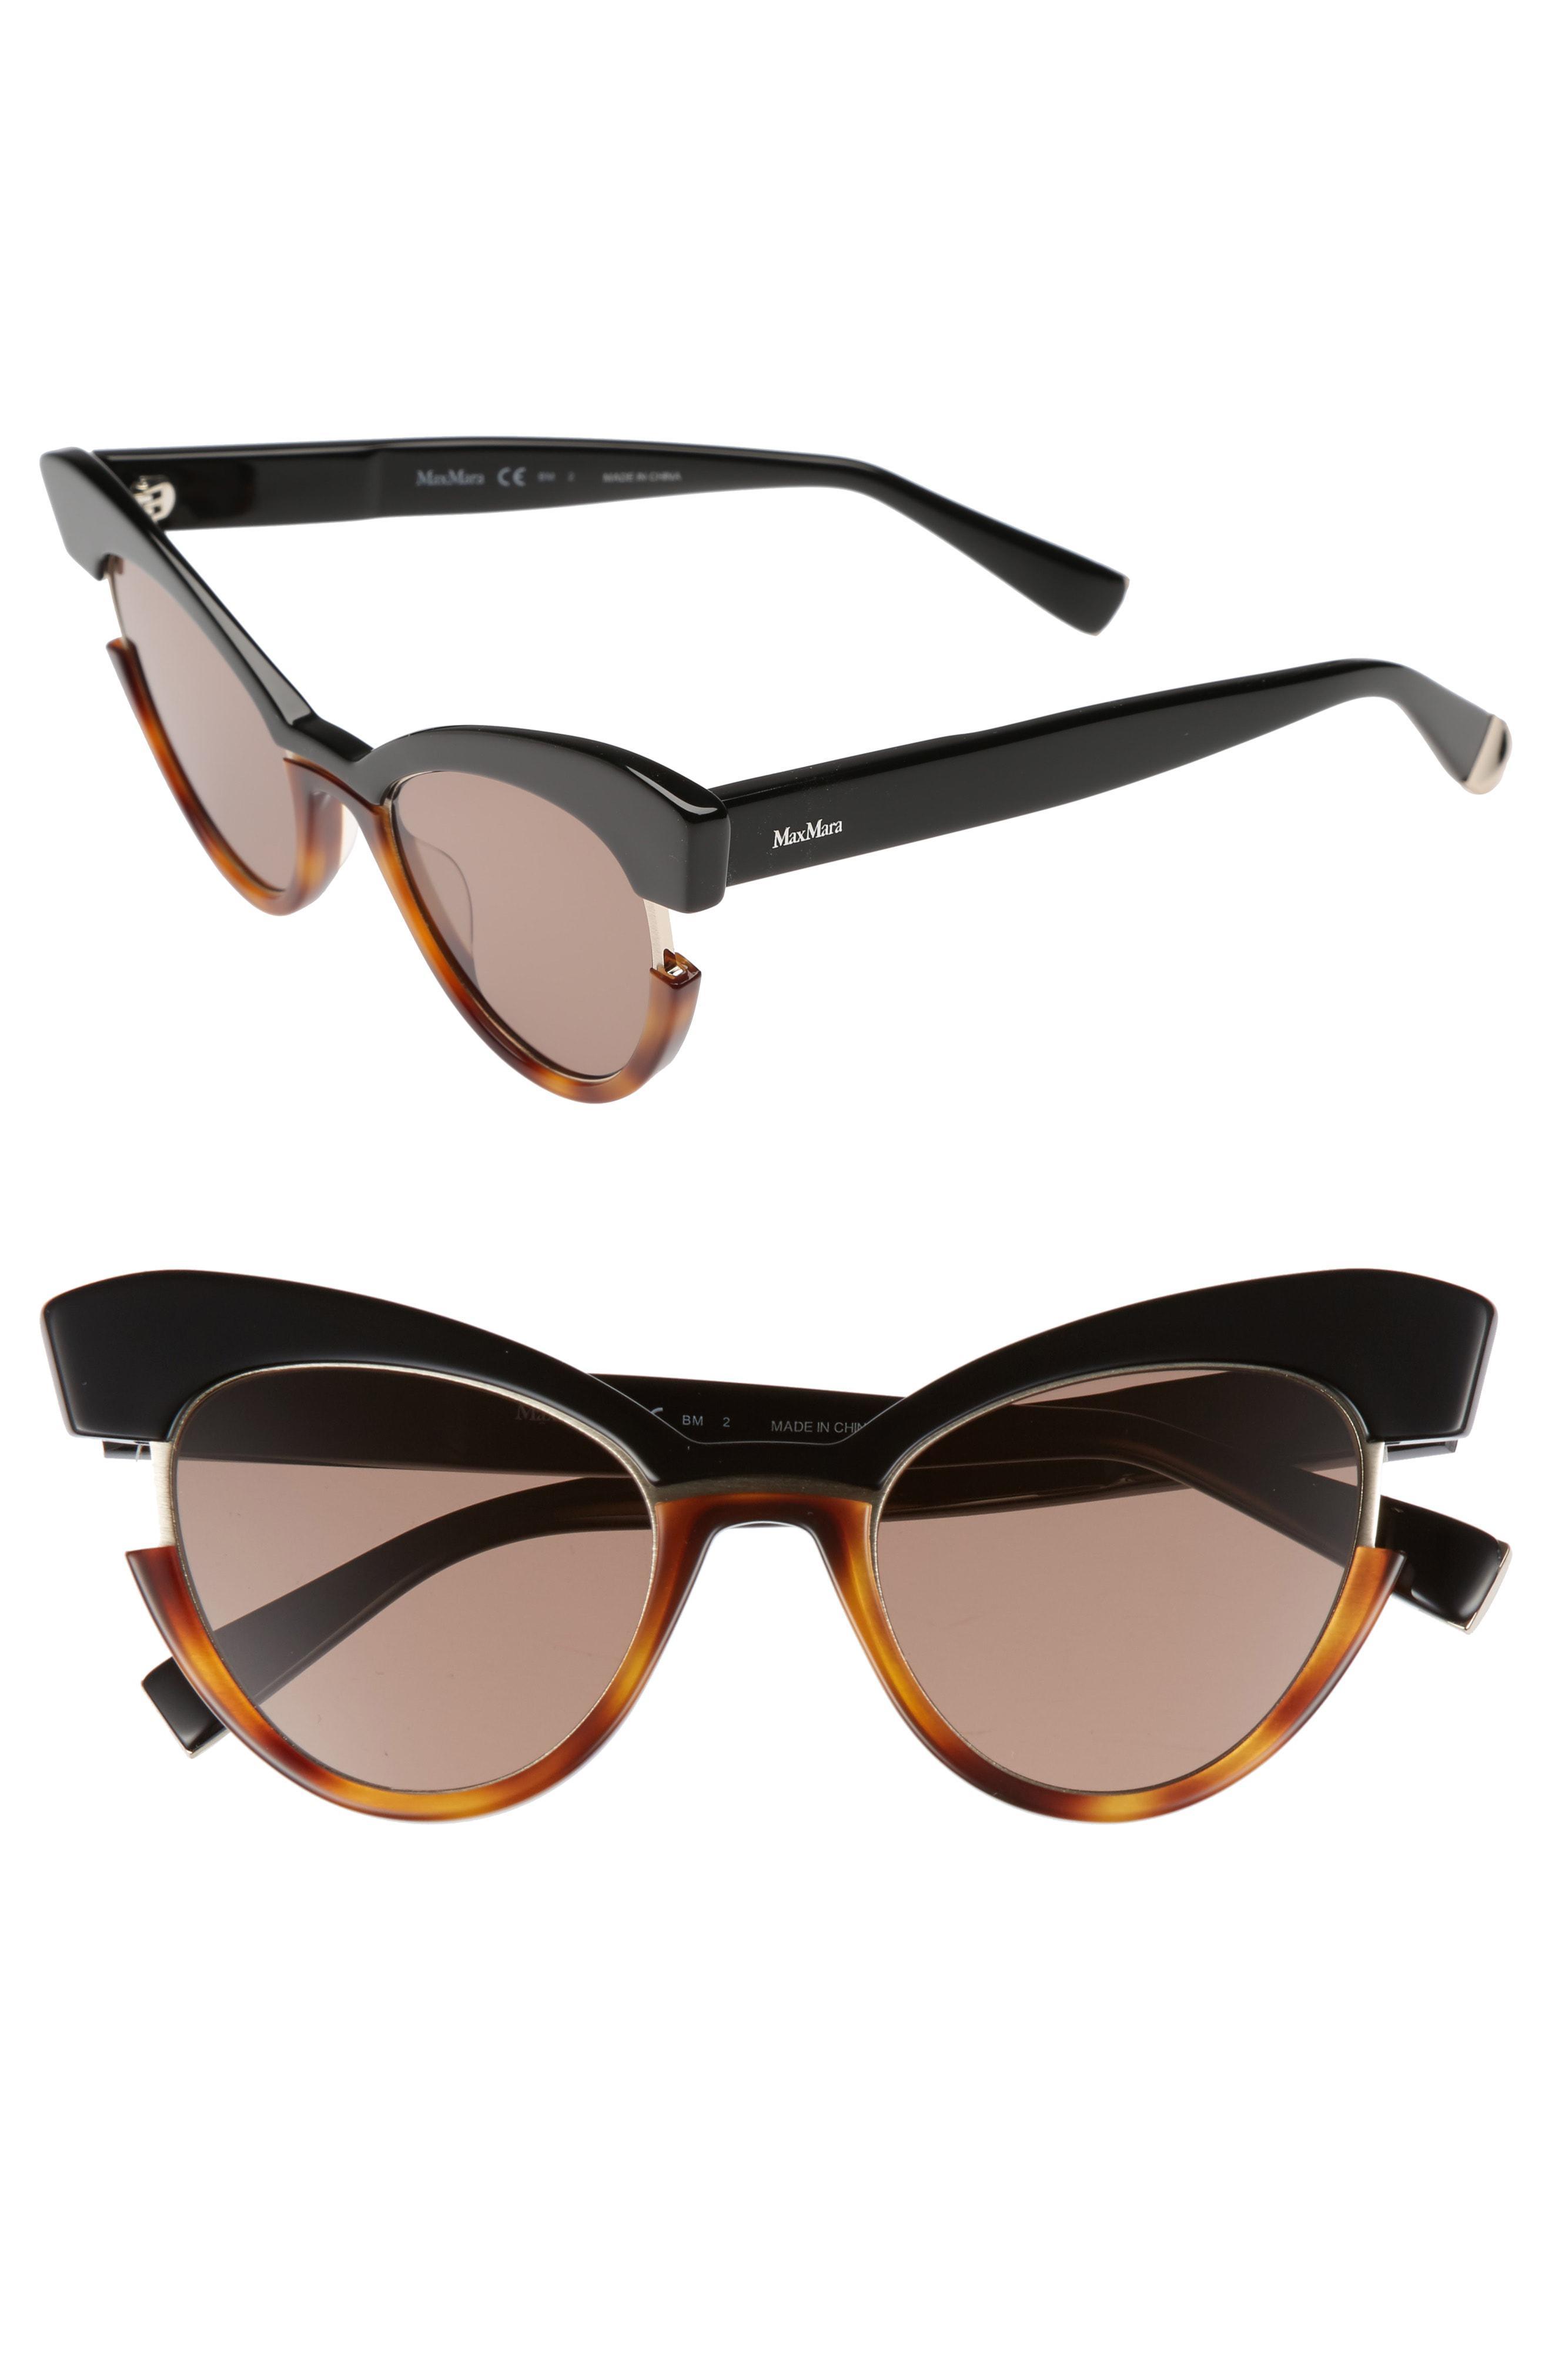 93e3db4677b Lyst - Max Mara 49mm Gradient Lens Cat Eye Sunglasses - in Blue